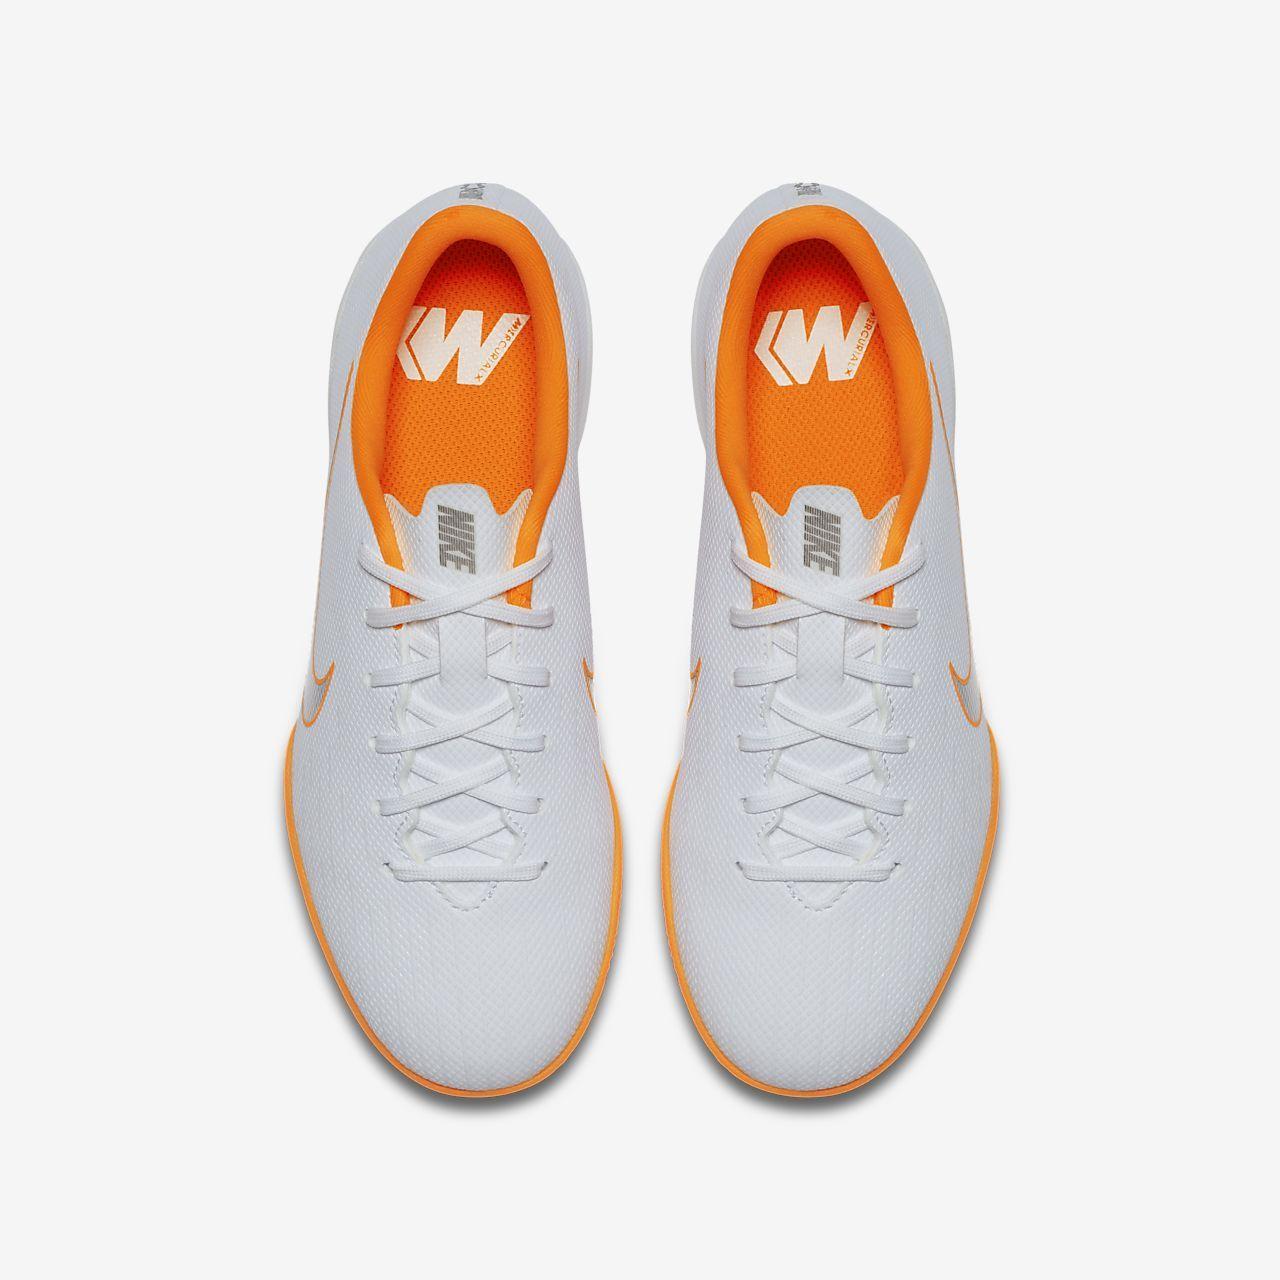 29ea04fe5f7 Nike Jr. MercurialX Vapor XII Academy Just Do It Younger Older Kids  Indoor Court  Football Shoe